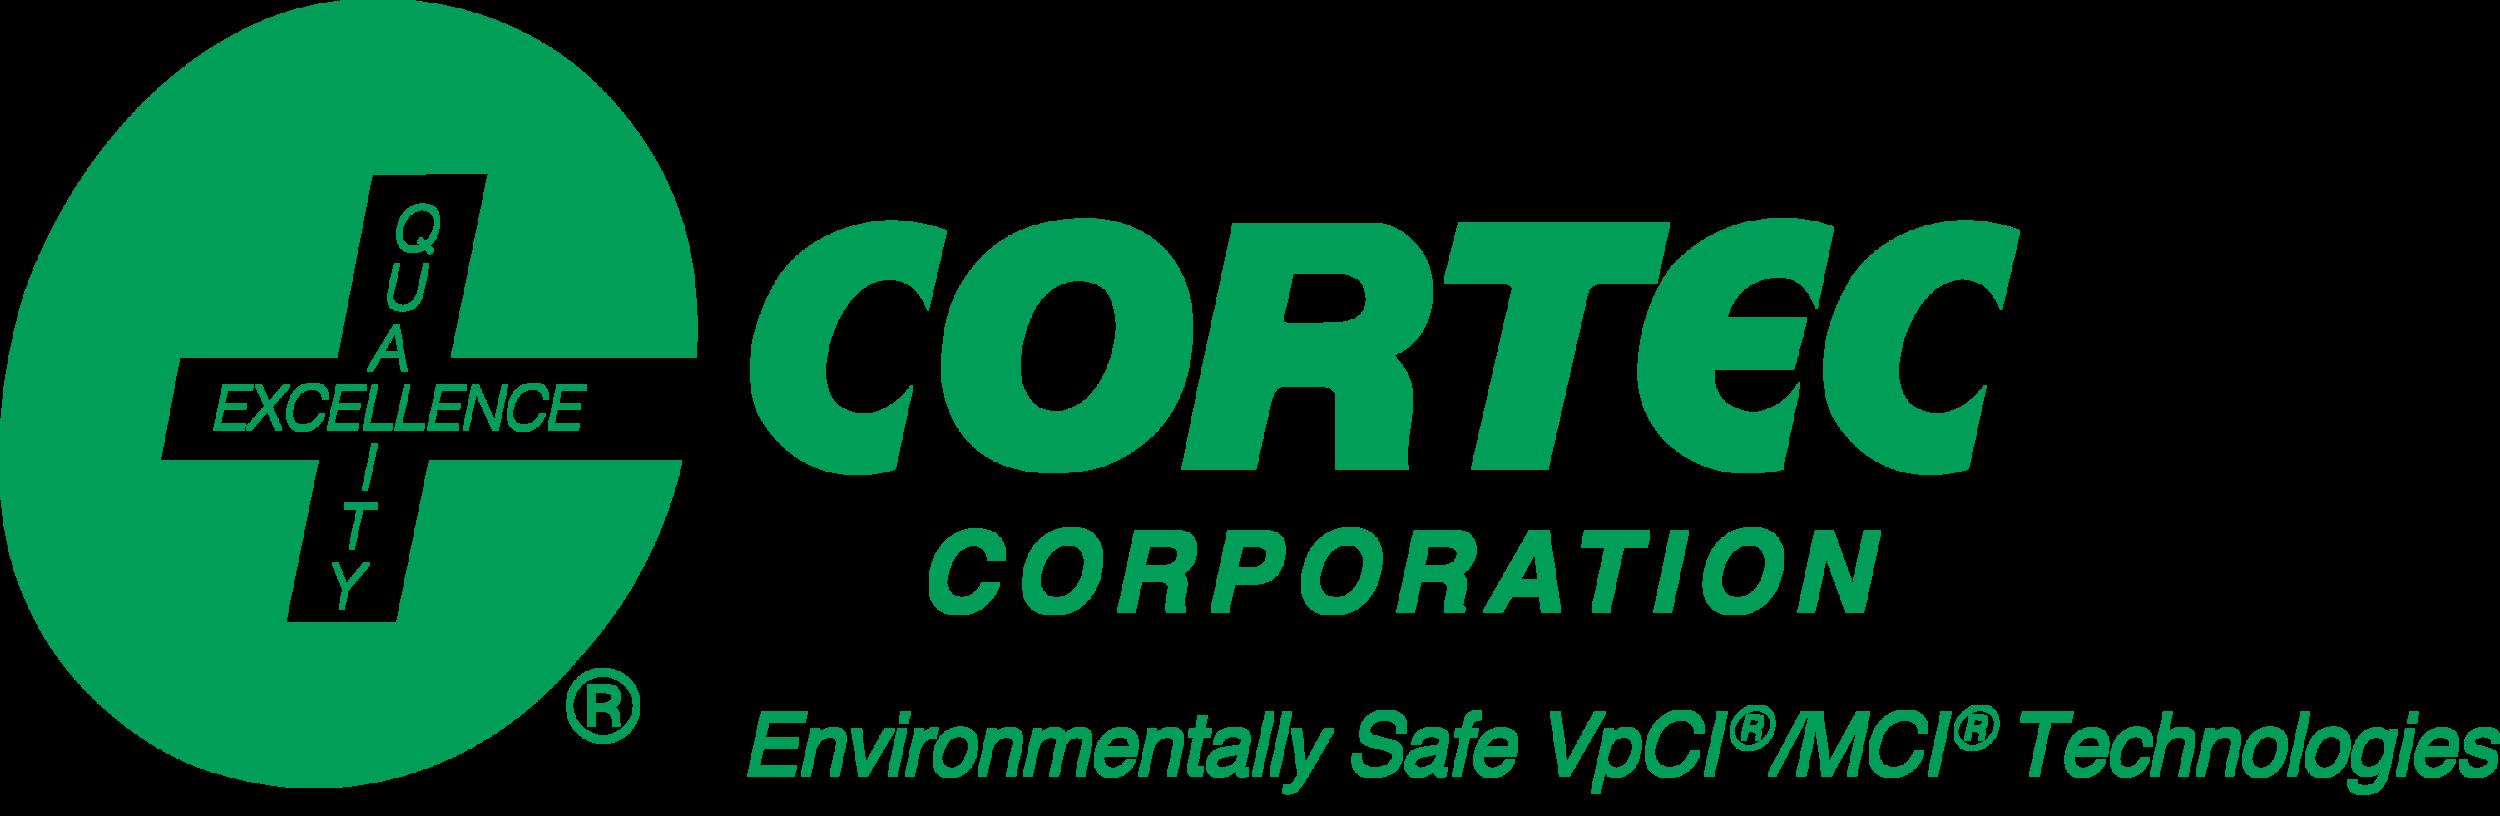 Cortec.png